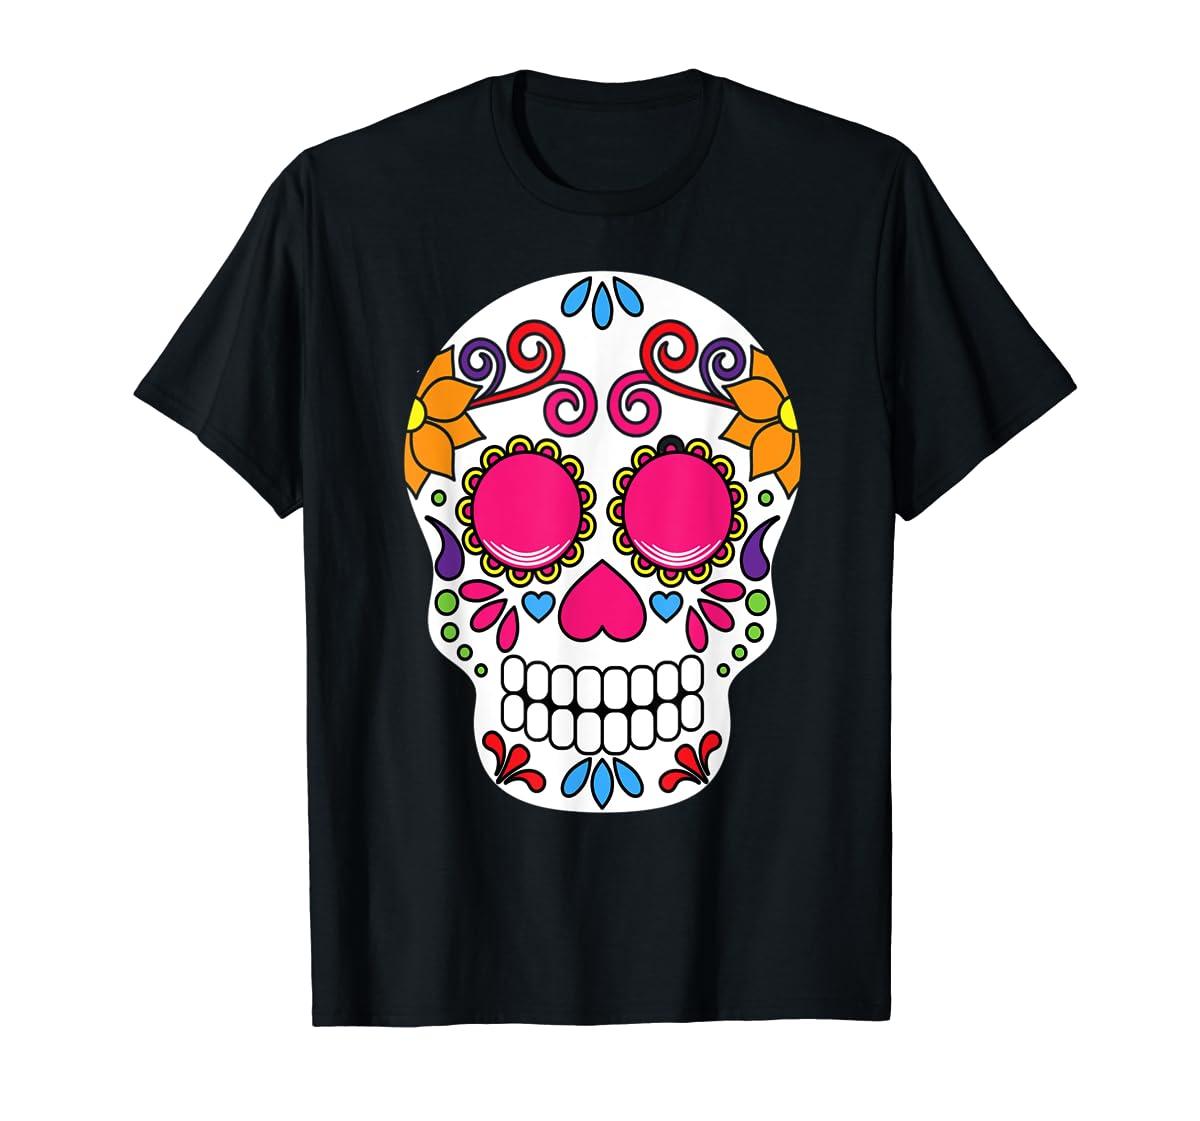 Colorful Day Of The Dead Sugar Skull Halloween T-shirt-Men's T-Shirt-Black